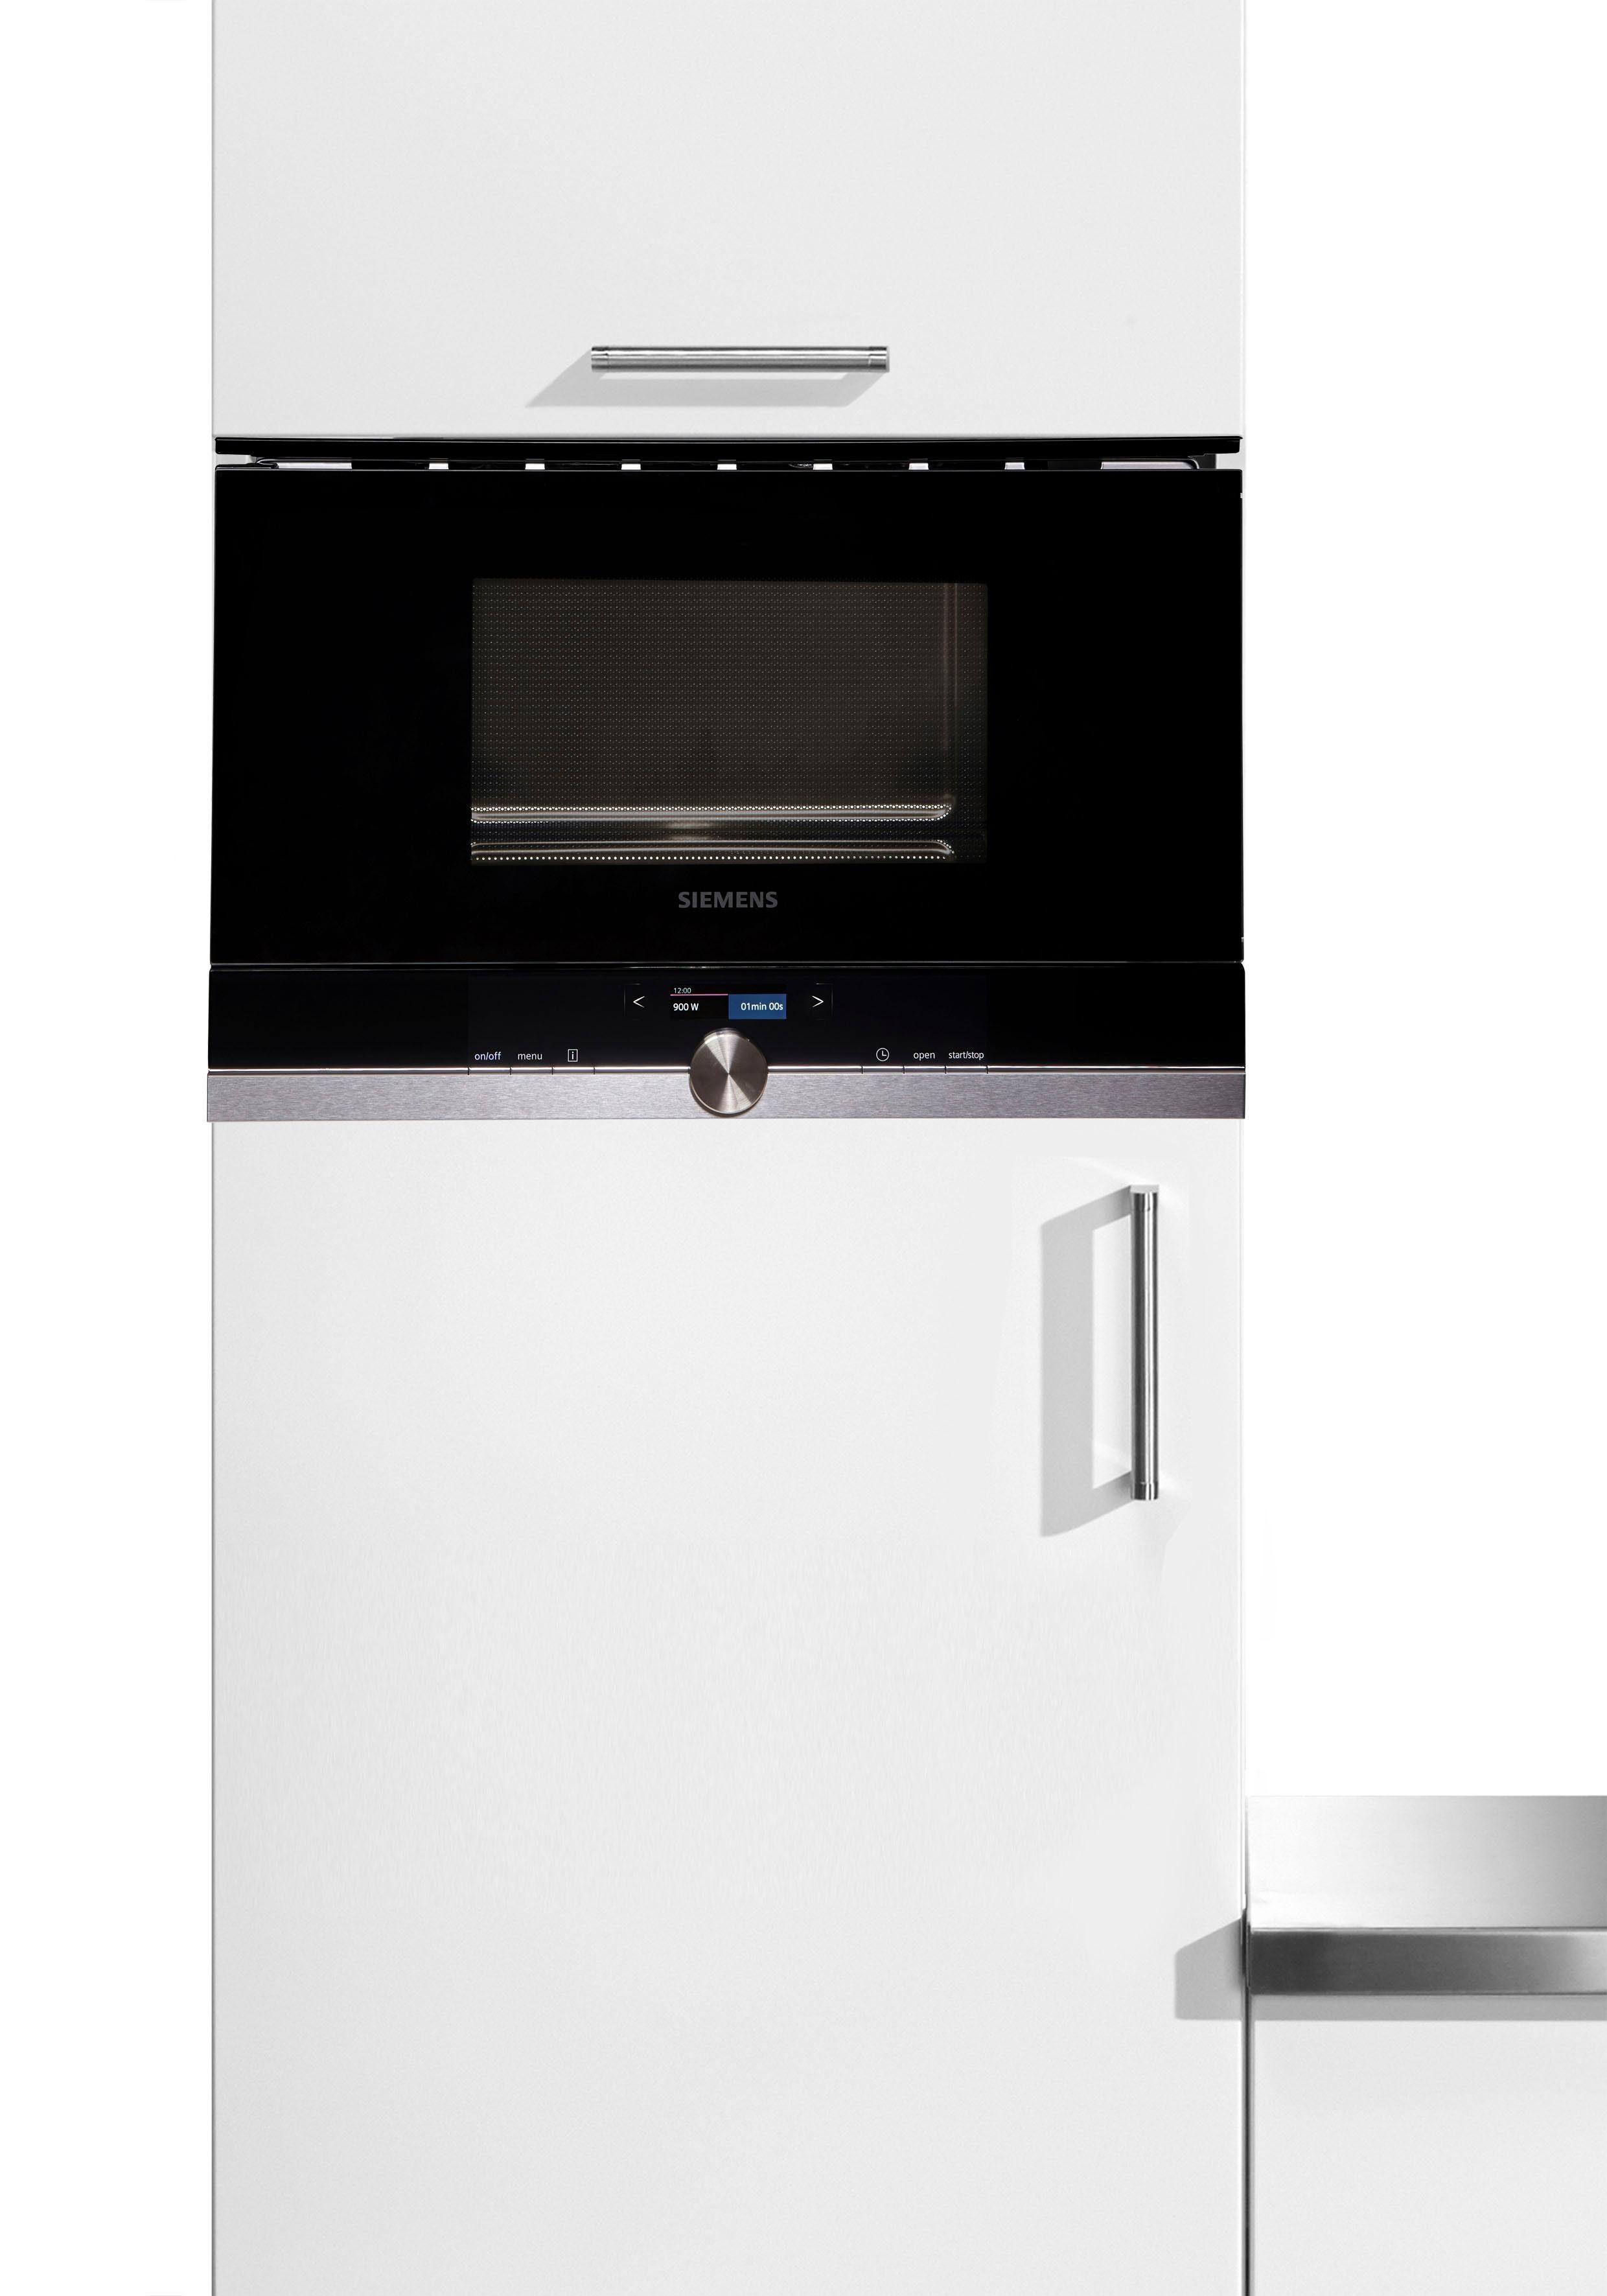 SIEMENS Einbau-Mikrowelle BF634RGW1, 900 W